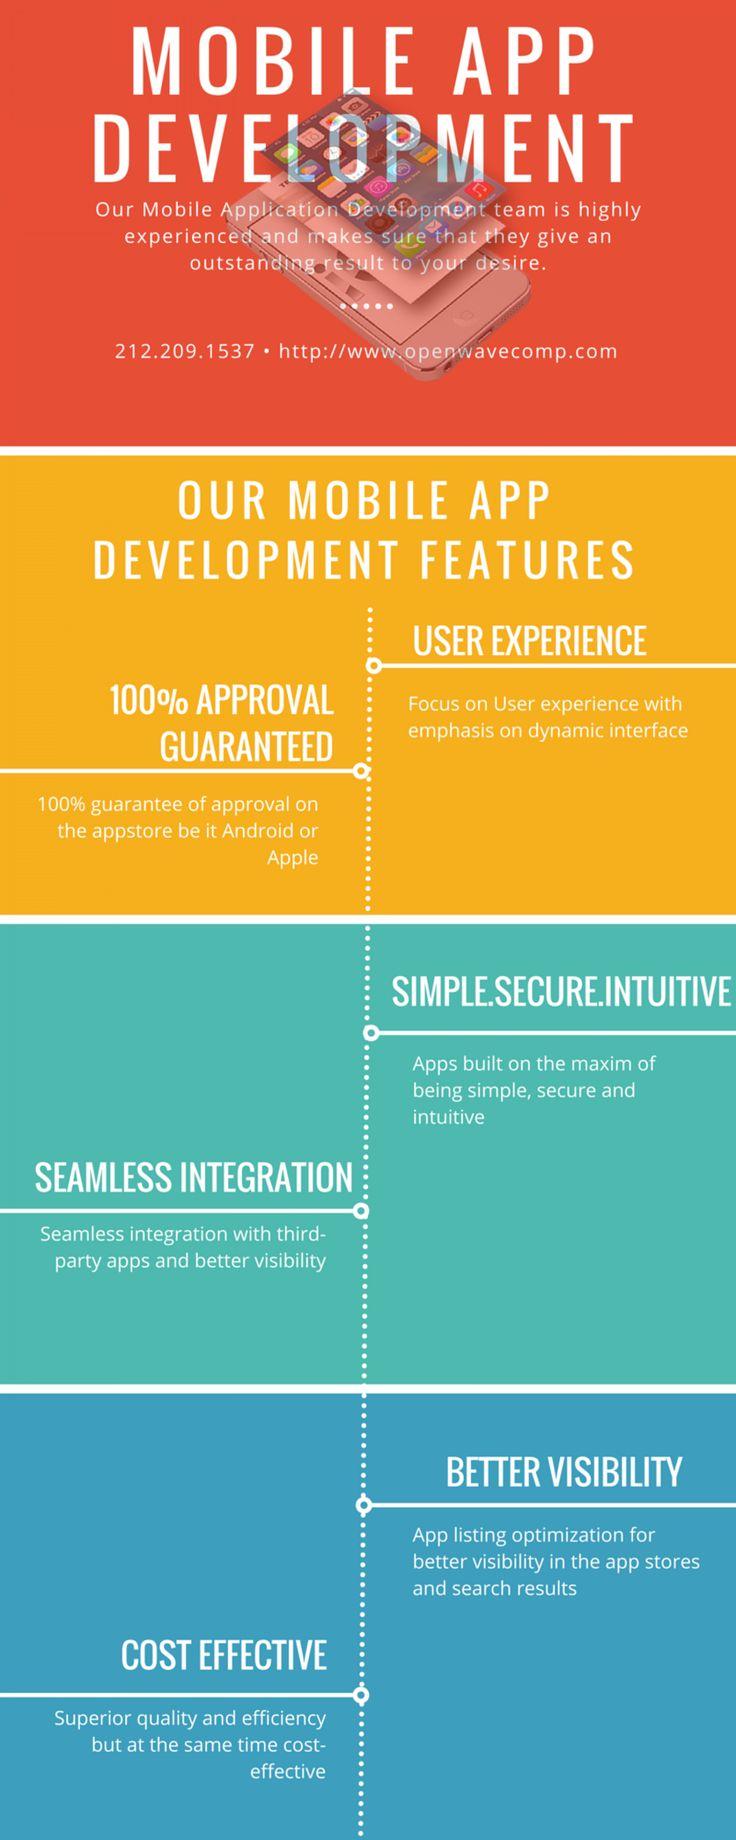 Mobile App Development Features Infographic